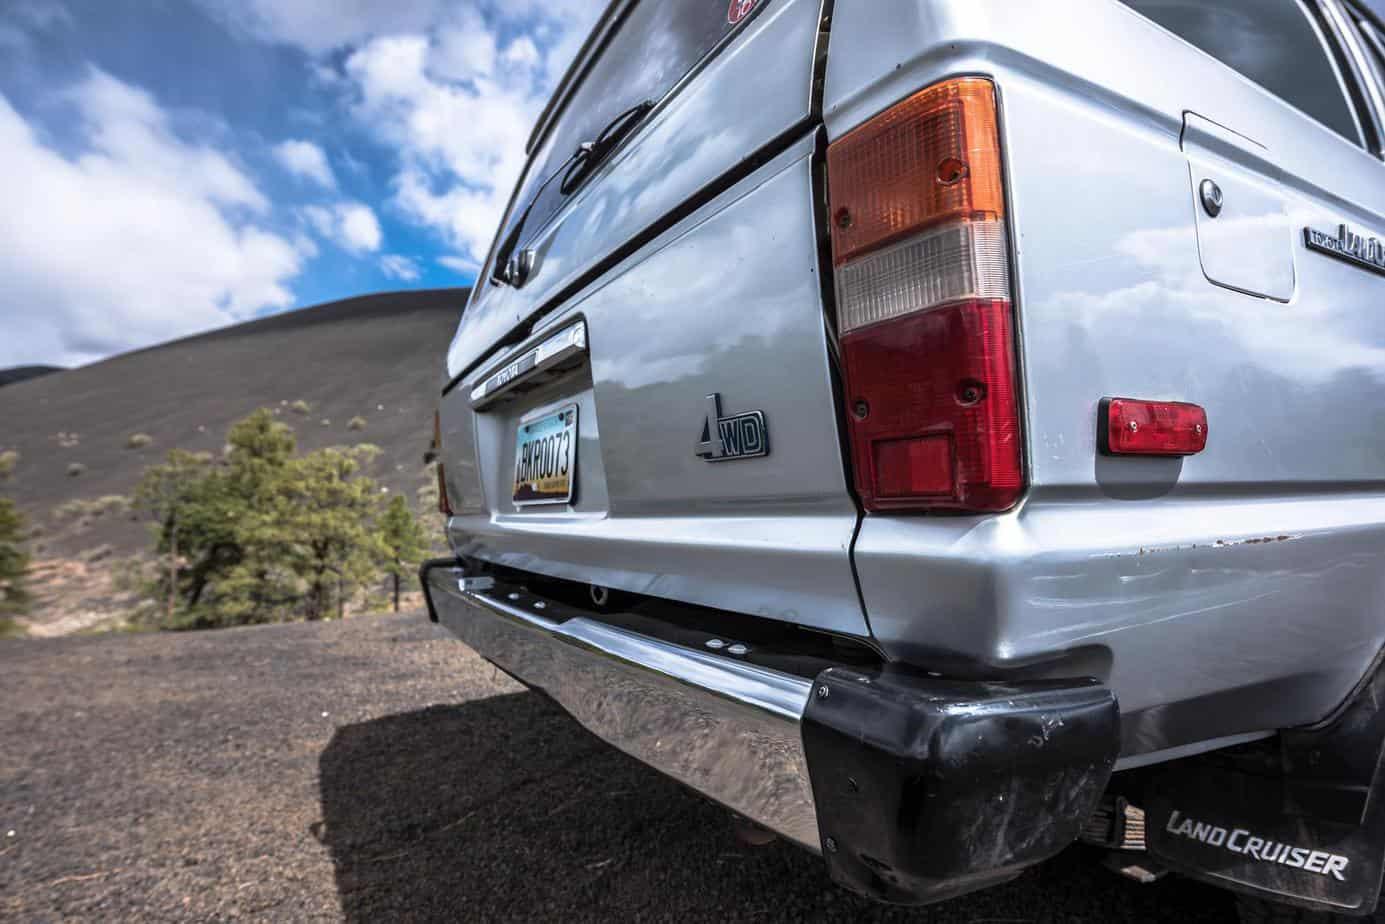 Adventure Driven rear-1 (Copy)